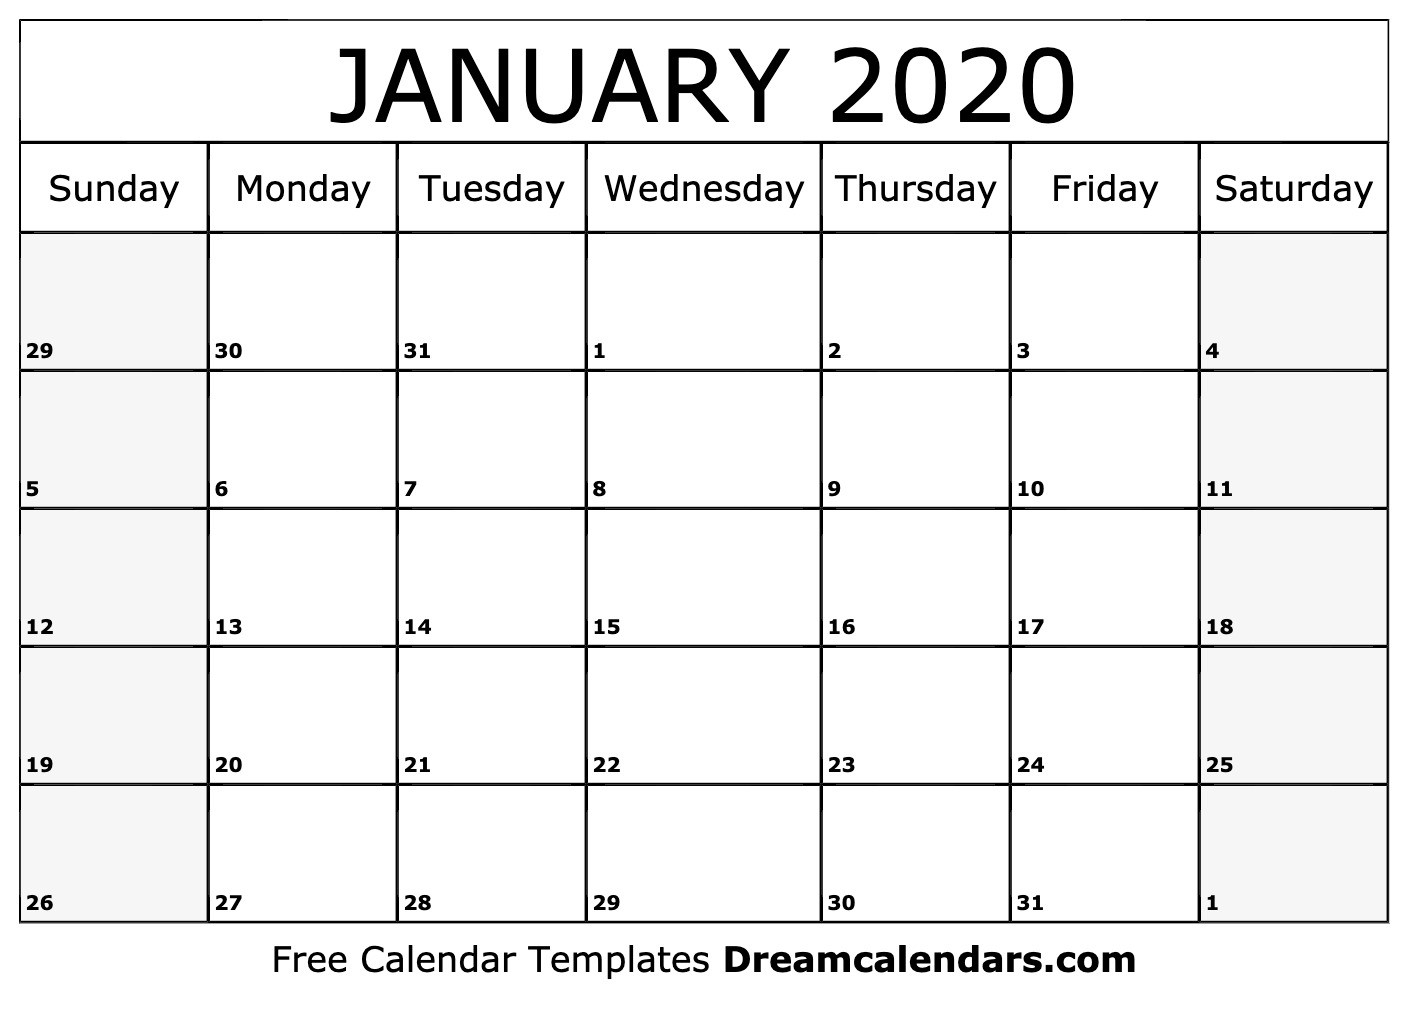 Dream Calendars - Make Your Calendar Template Blog-January 2020 Hebrew Calendar